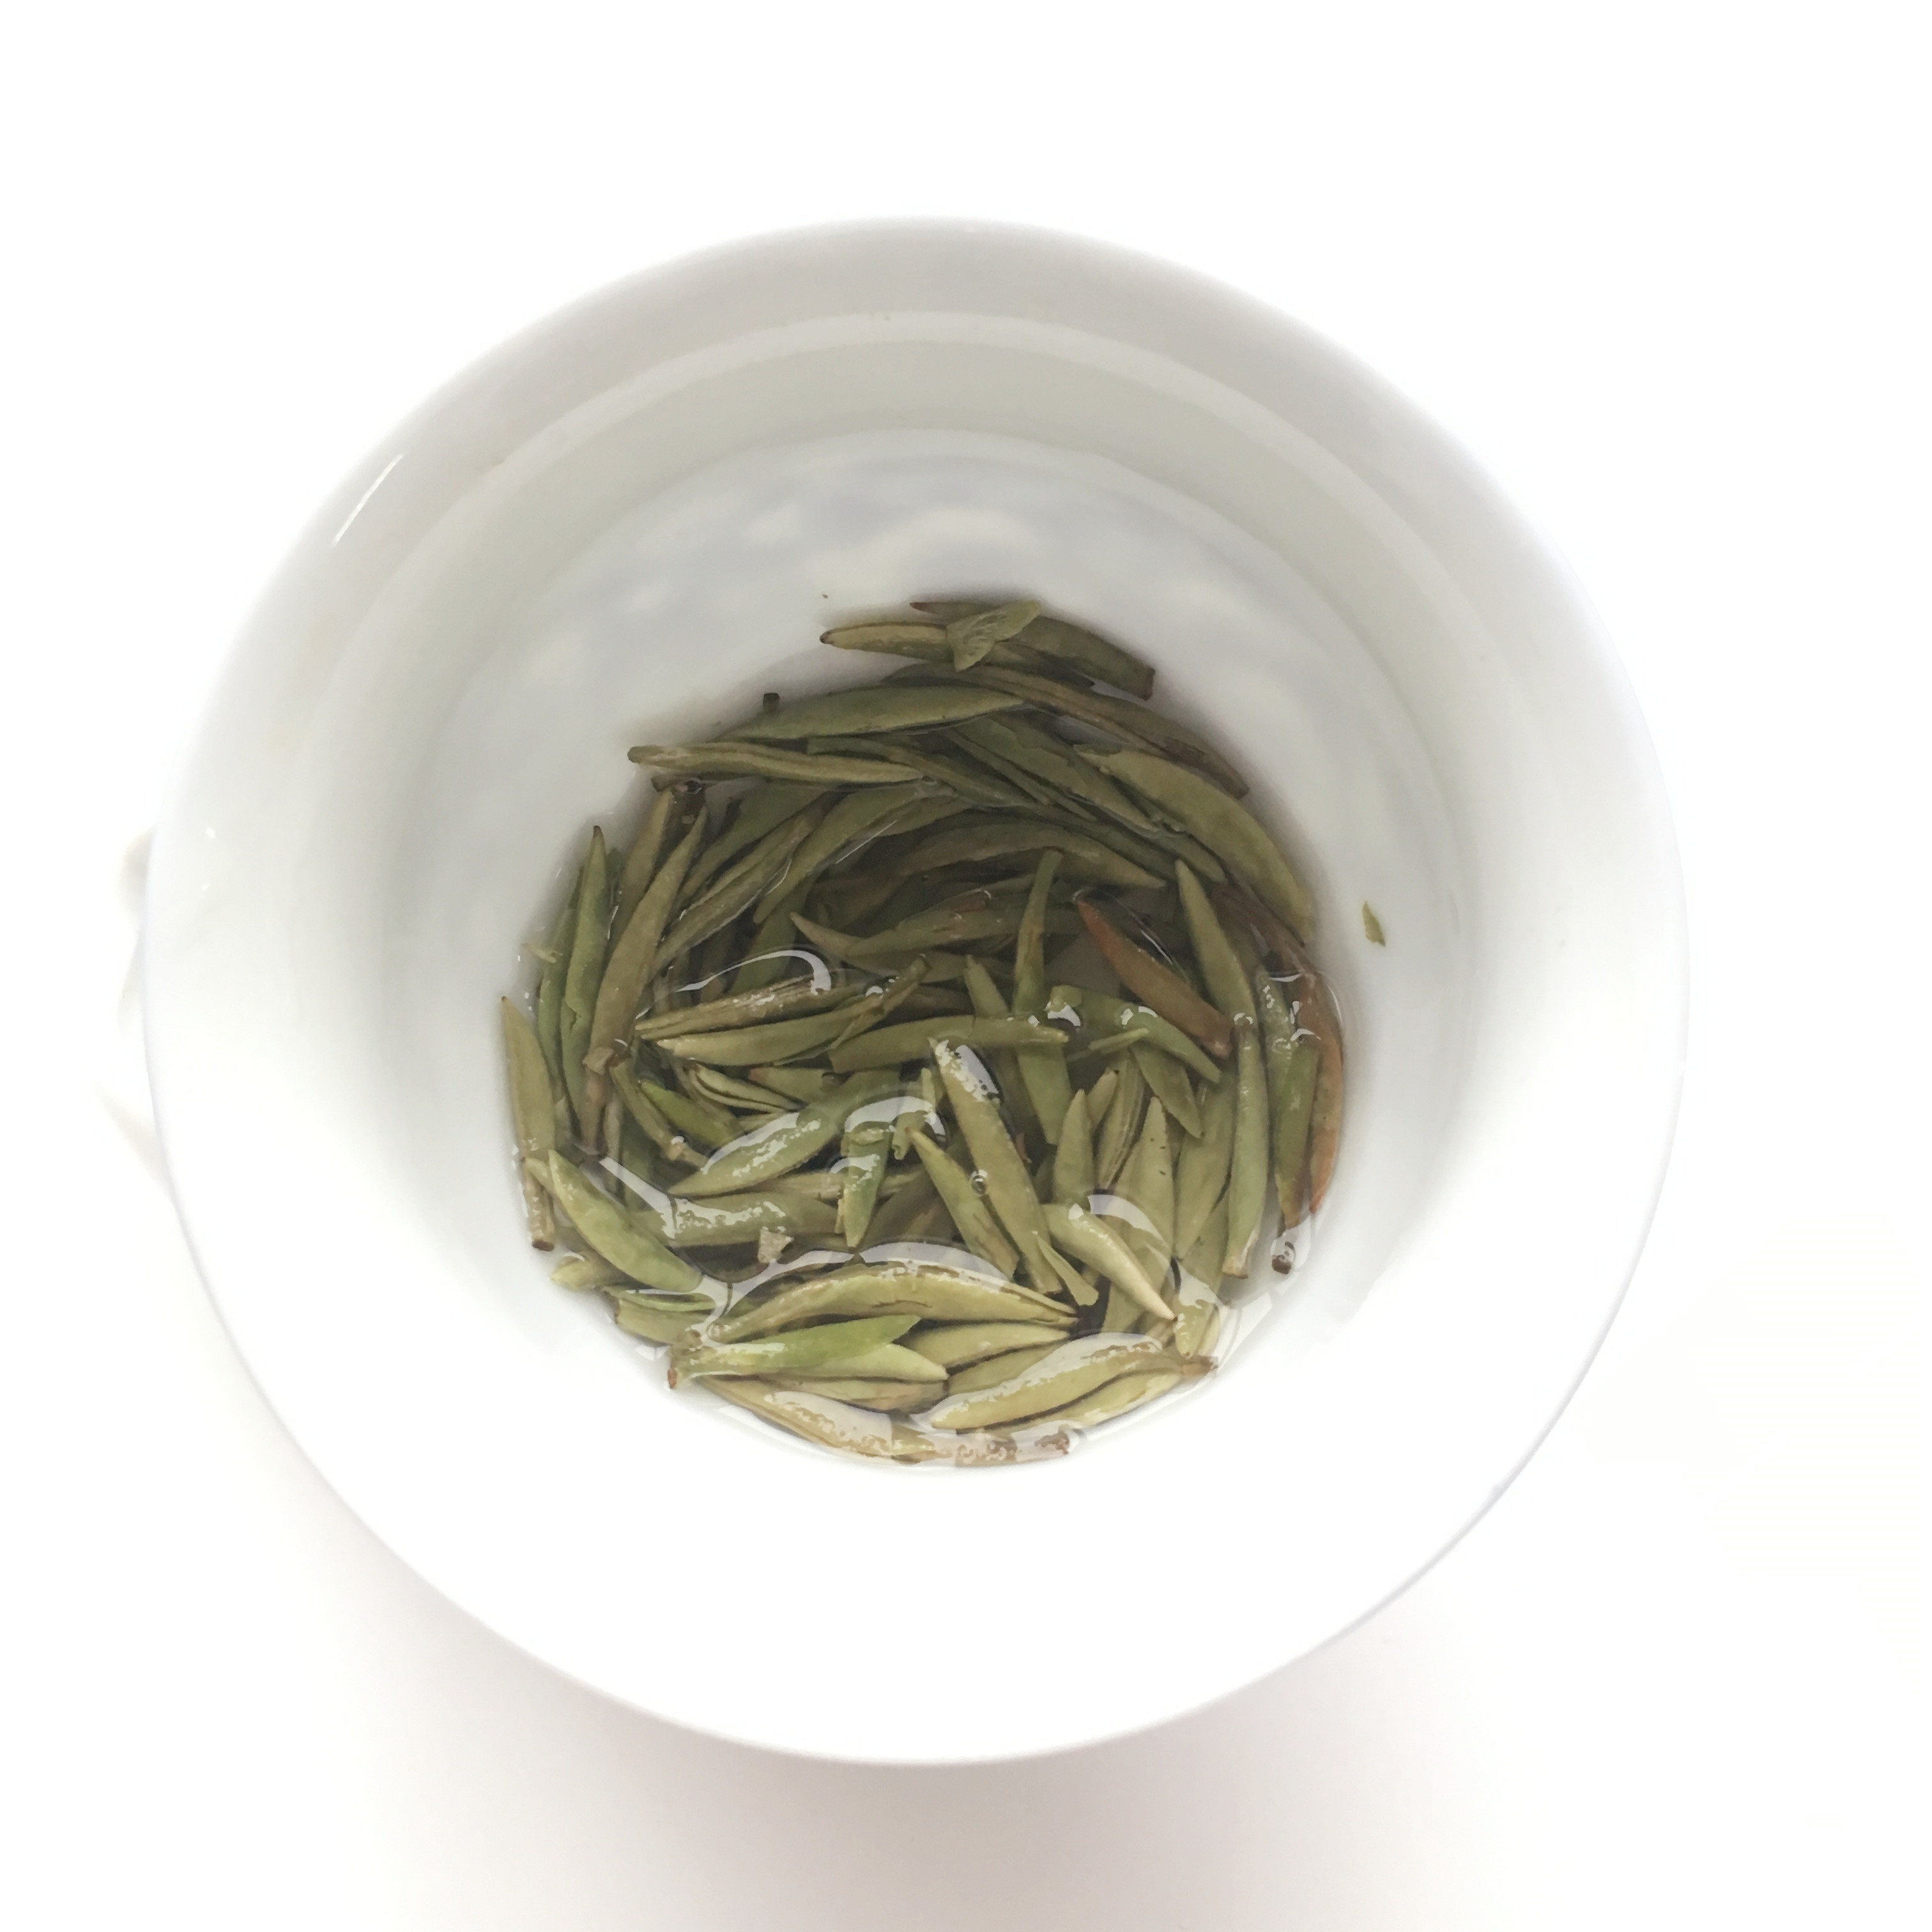 gift packing EU standard white tea Sliver Needles bai hao yin zhen per tin - 4uTea   4uTea.com